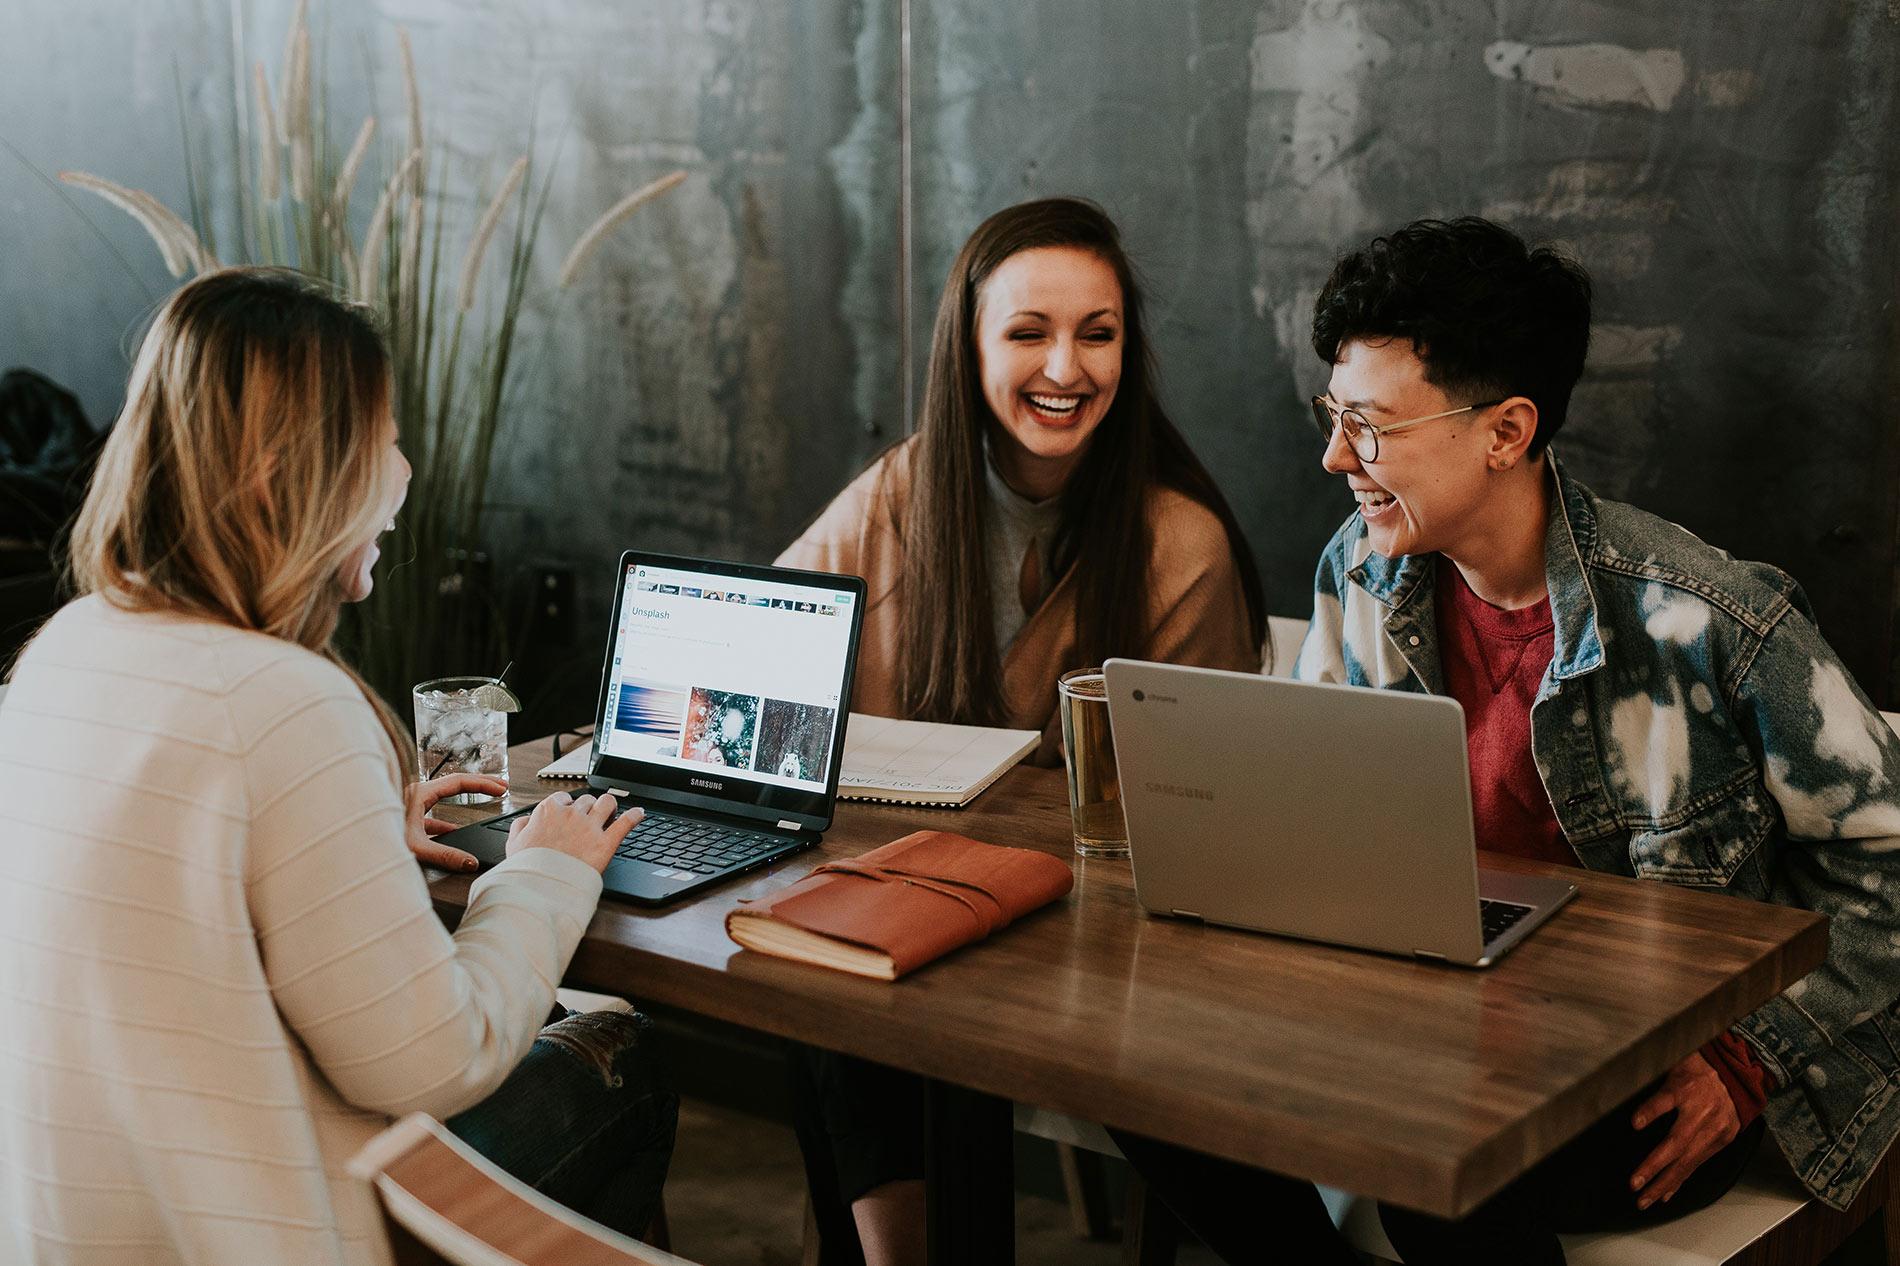 The challenge for Millennials